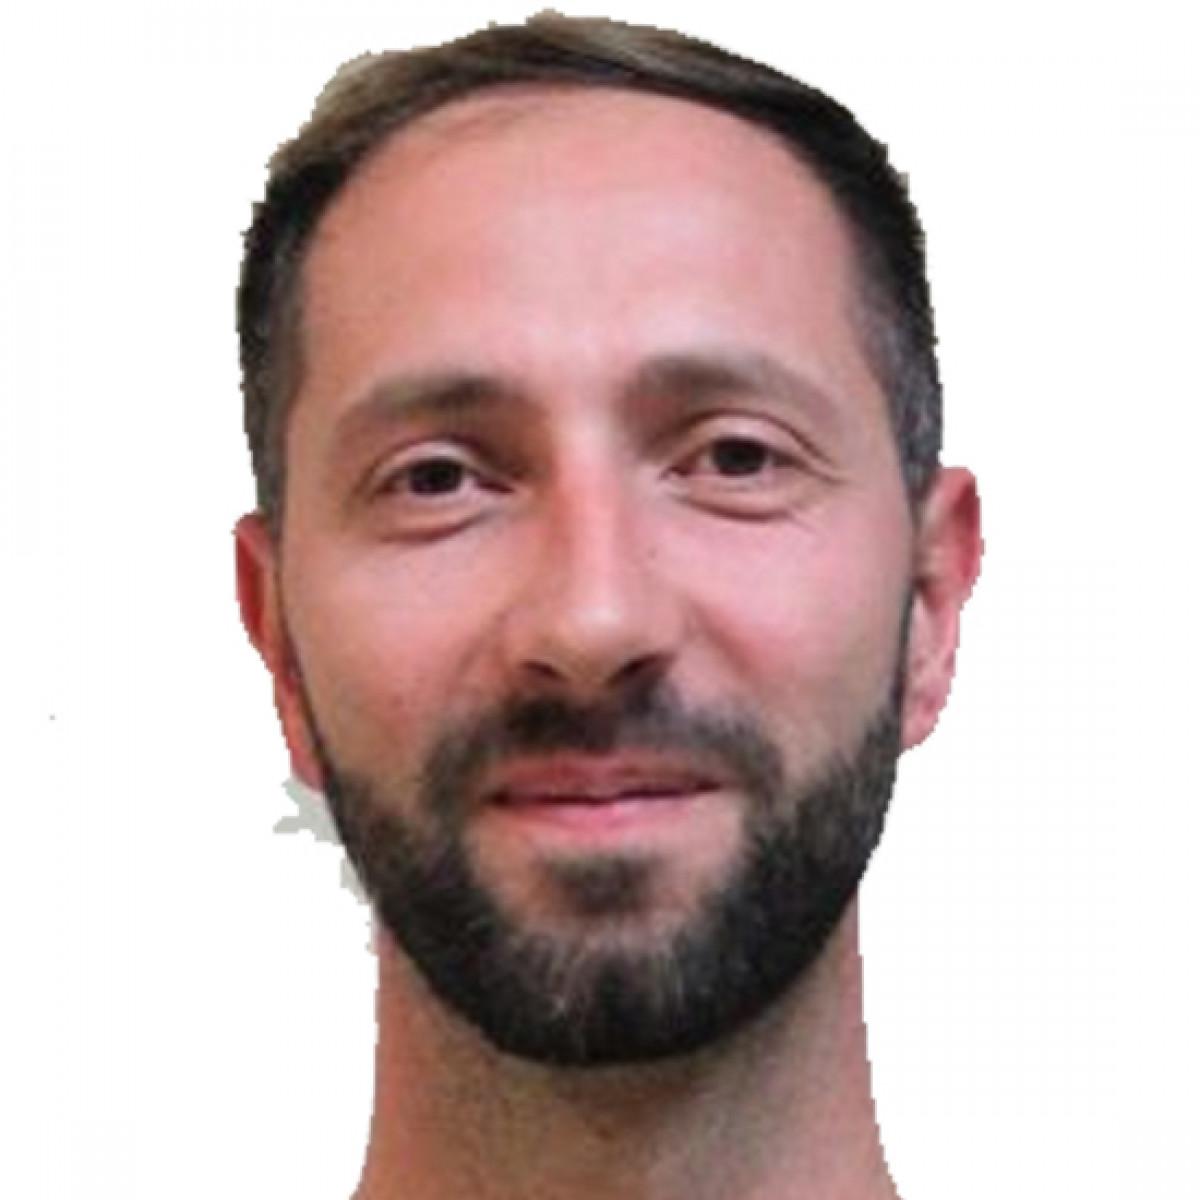 Hasan Rizvic